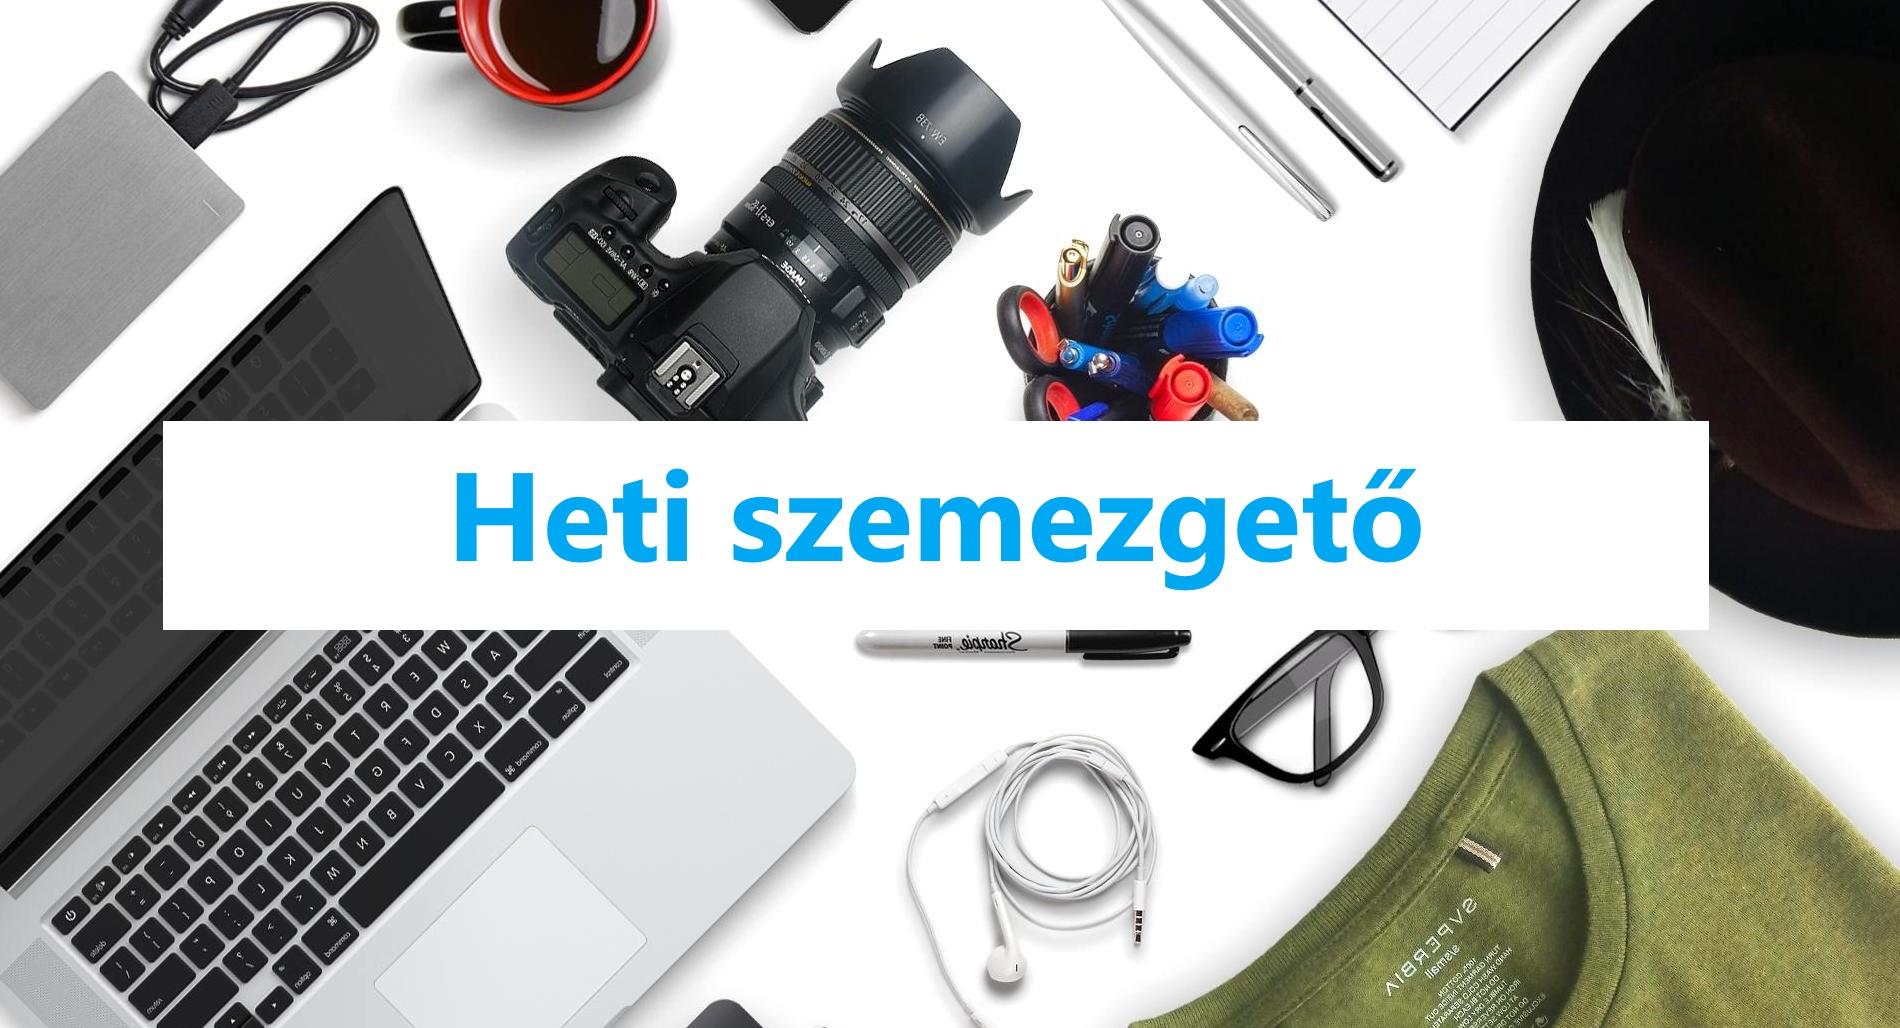 heti_szemezgeto_uj_82.jpg